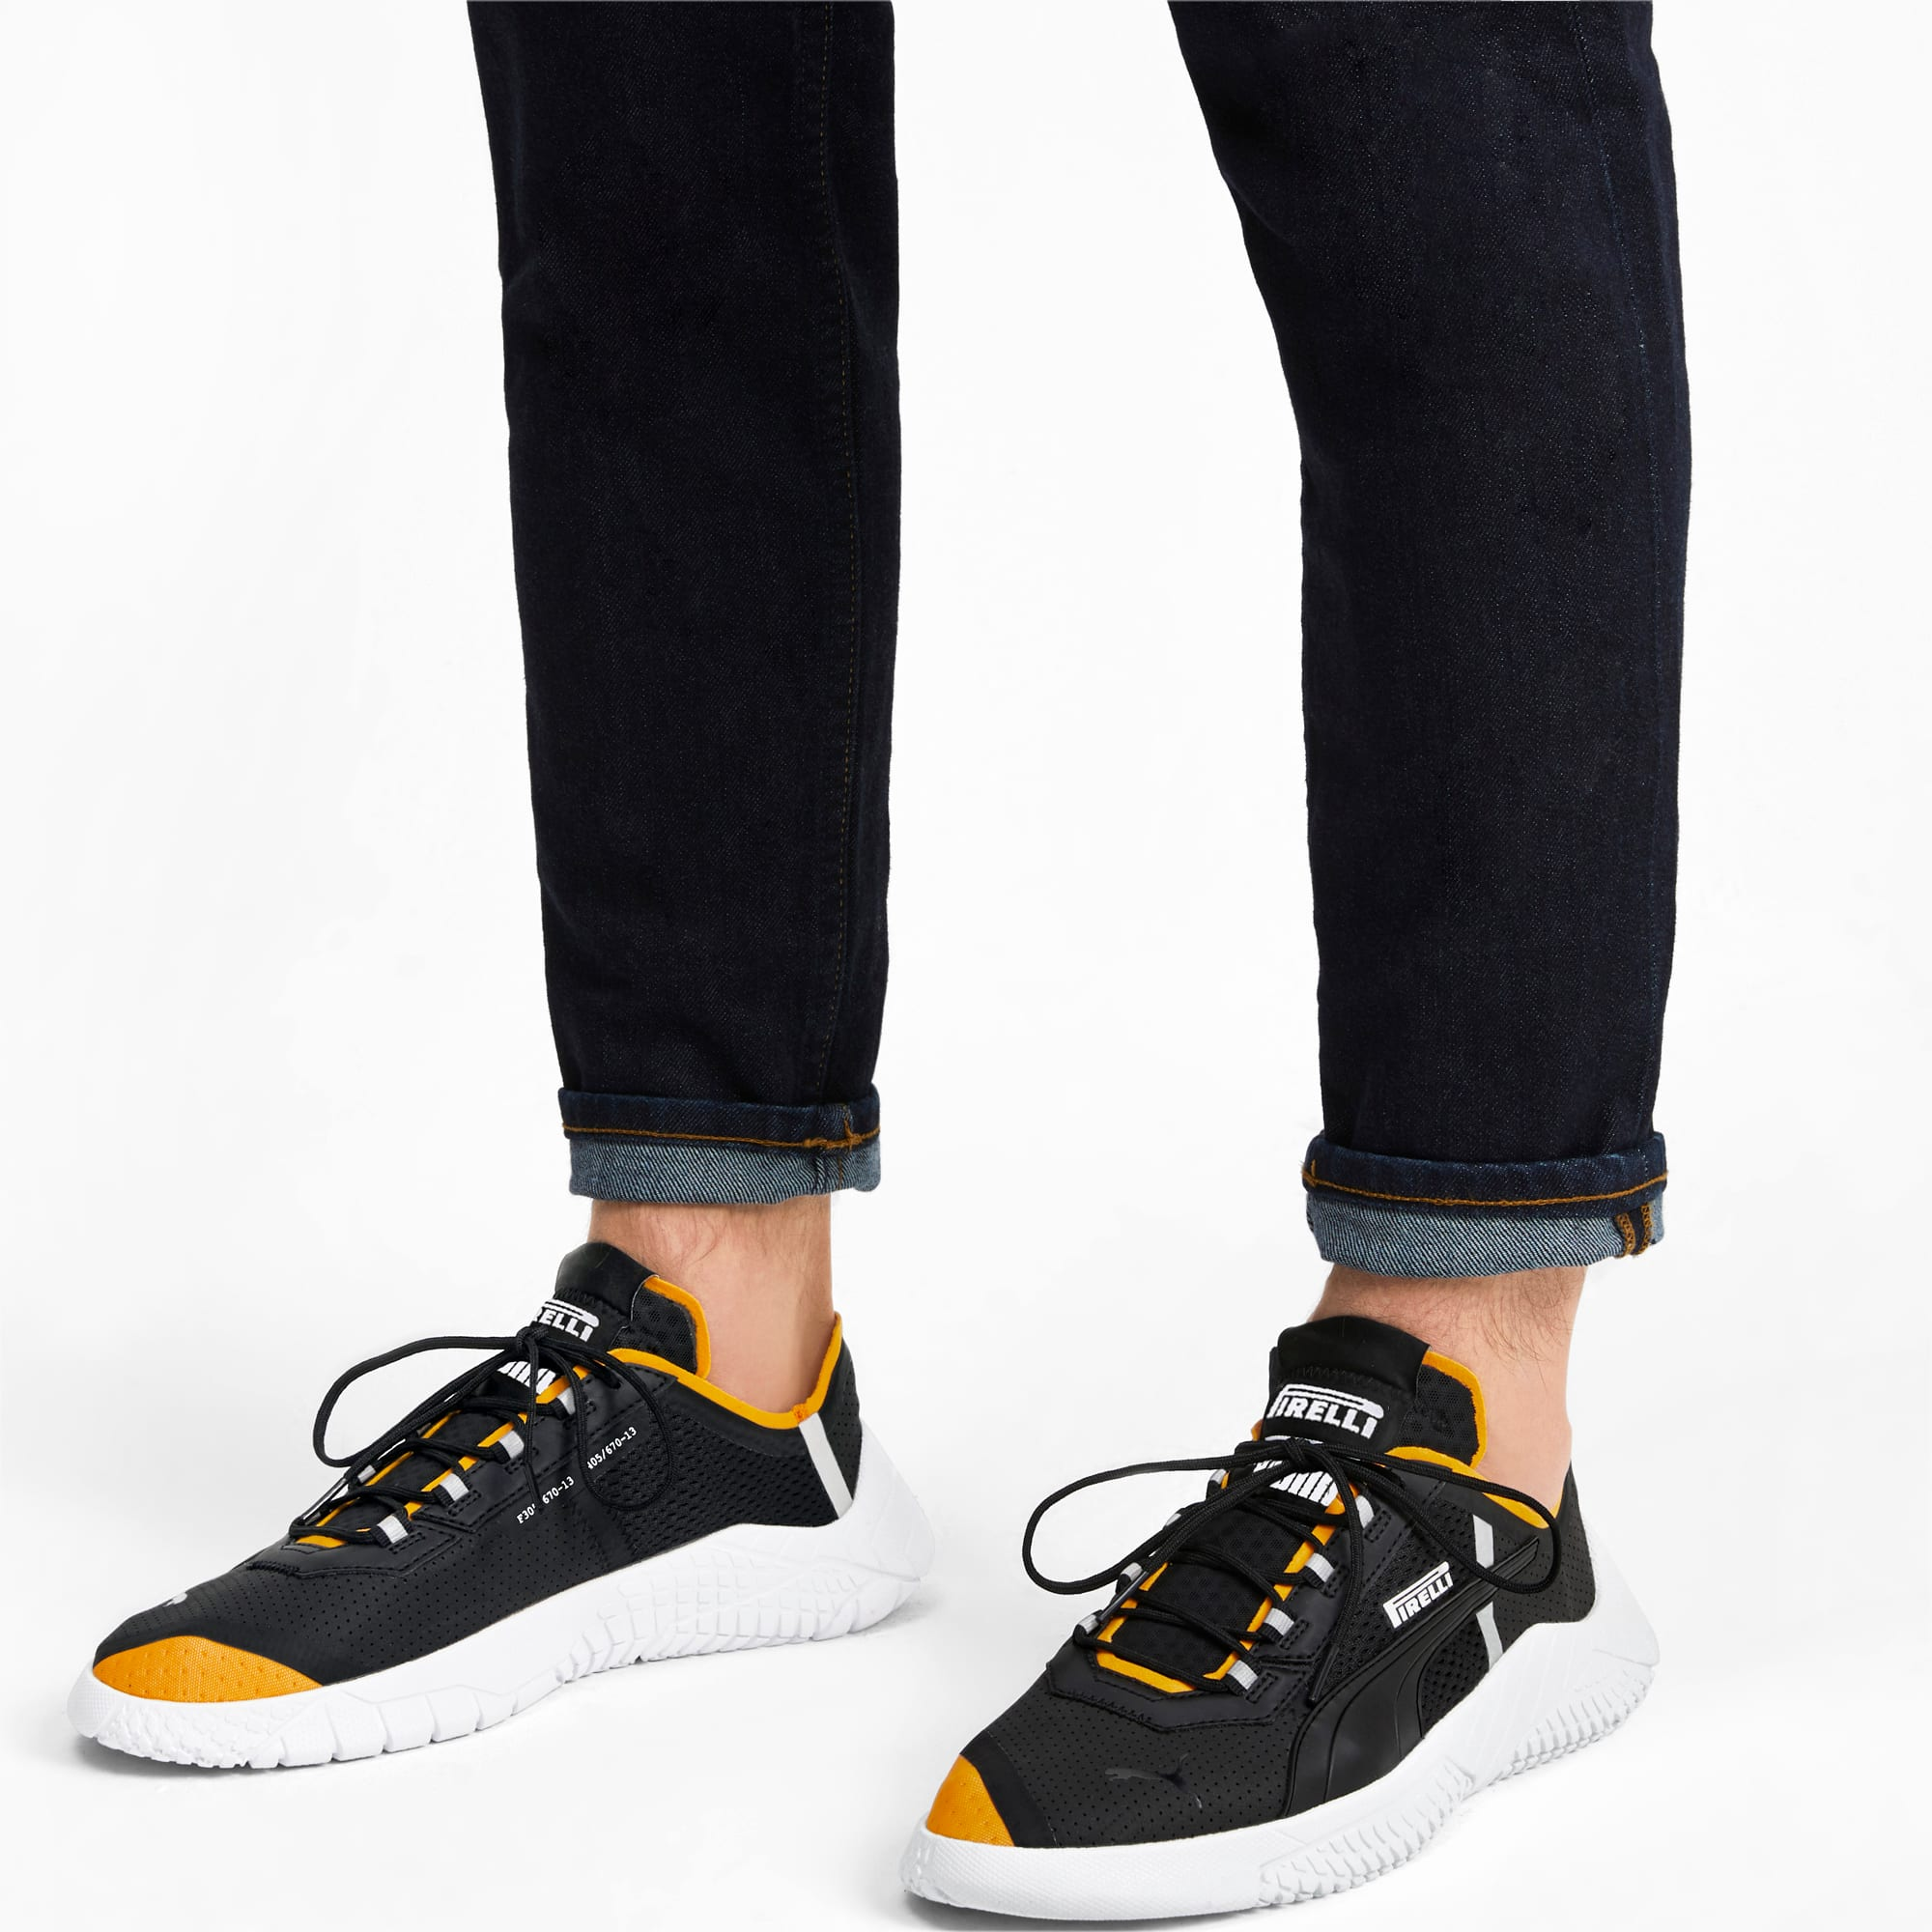 PUMA x PIRELLI Replicat X Sneaker